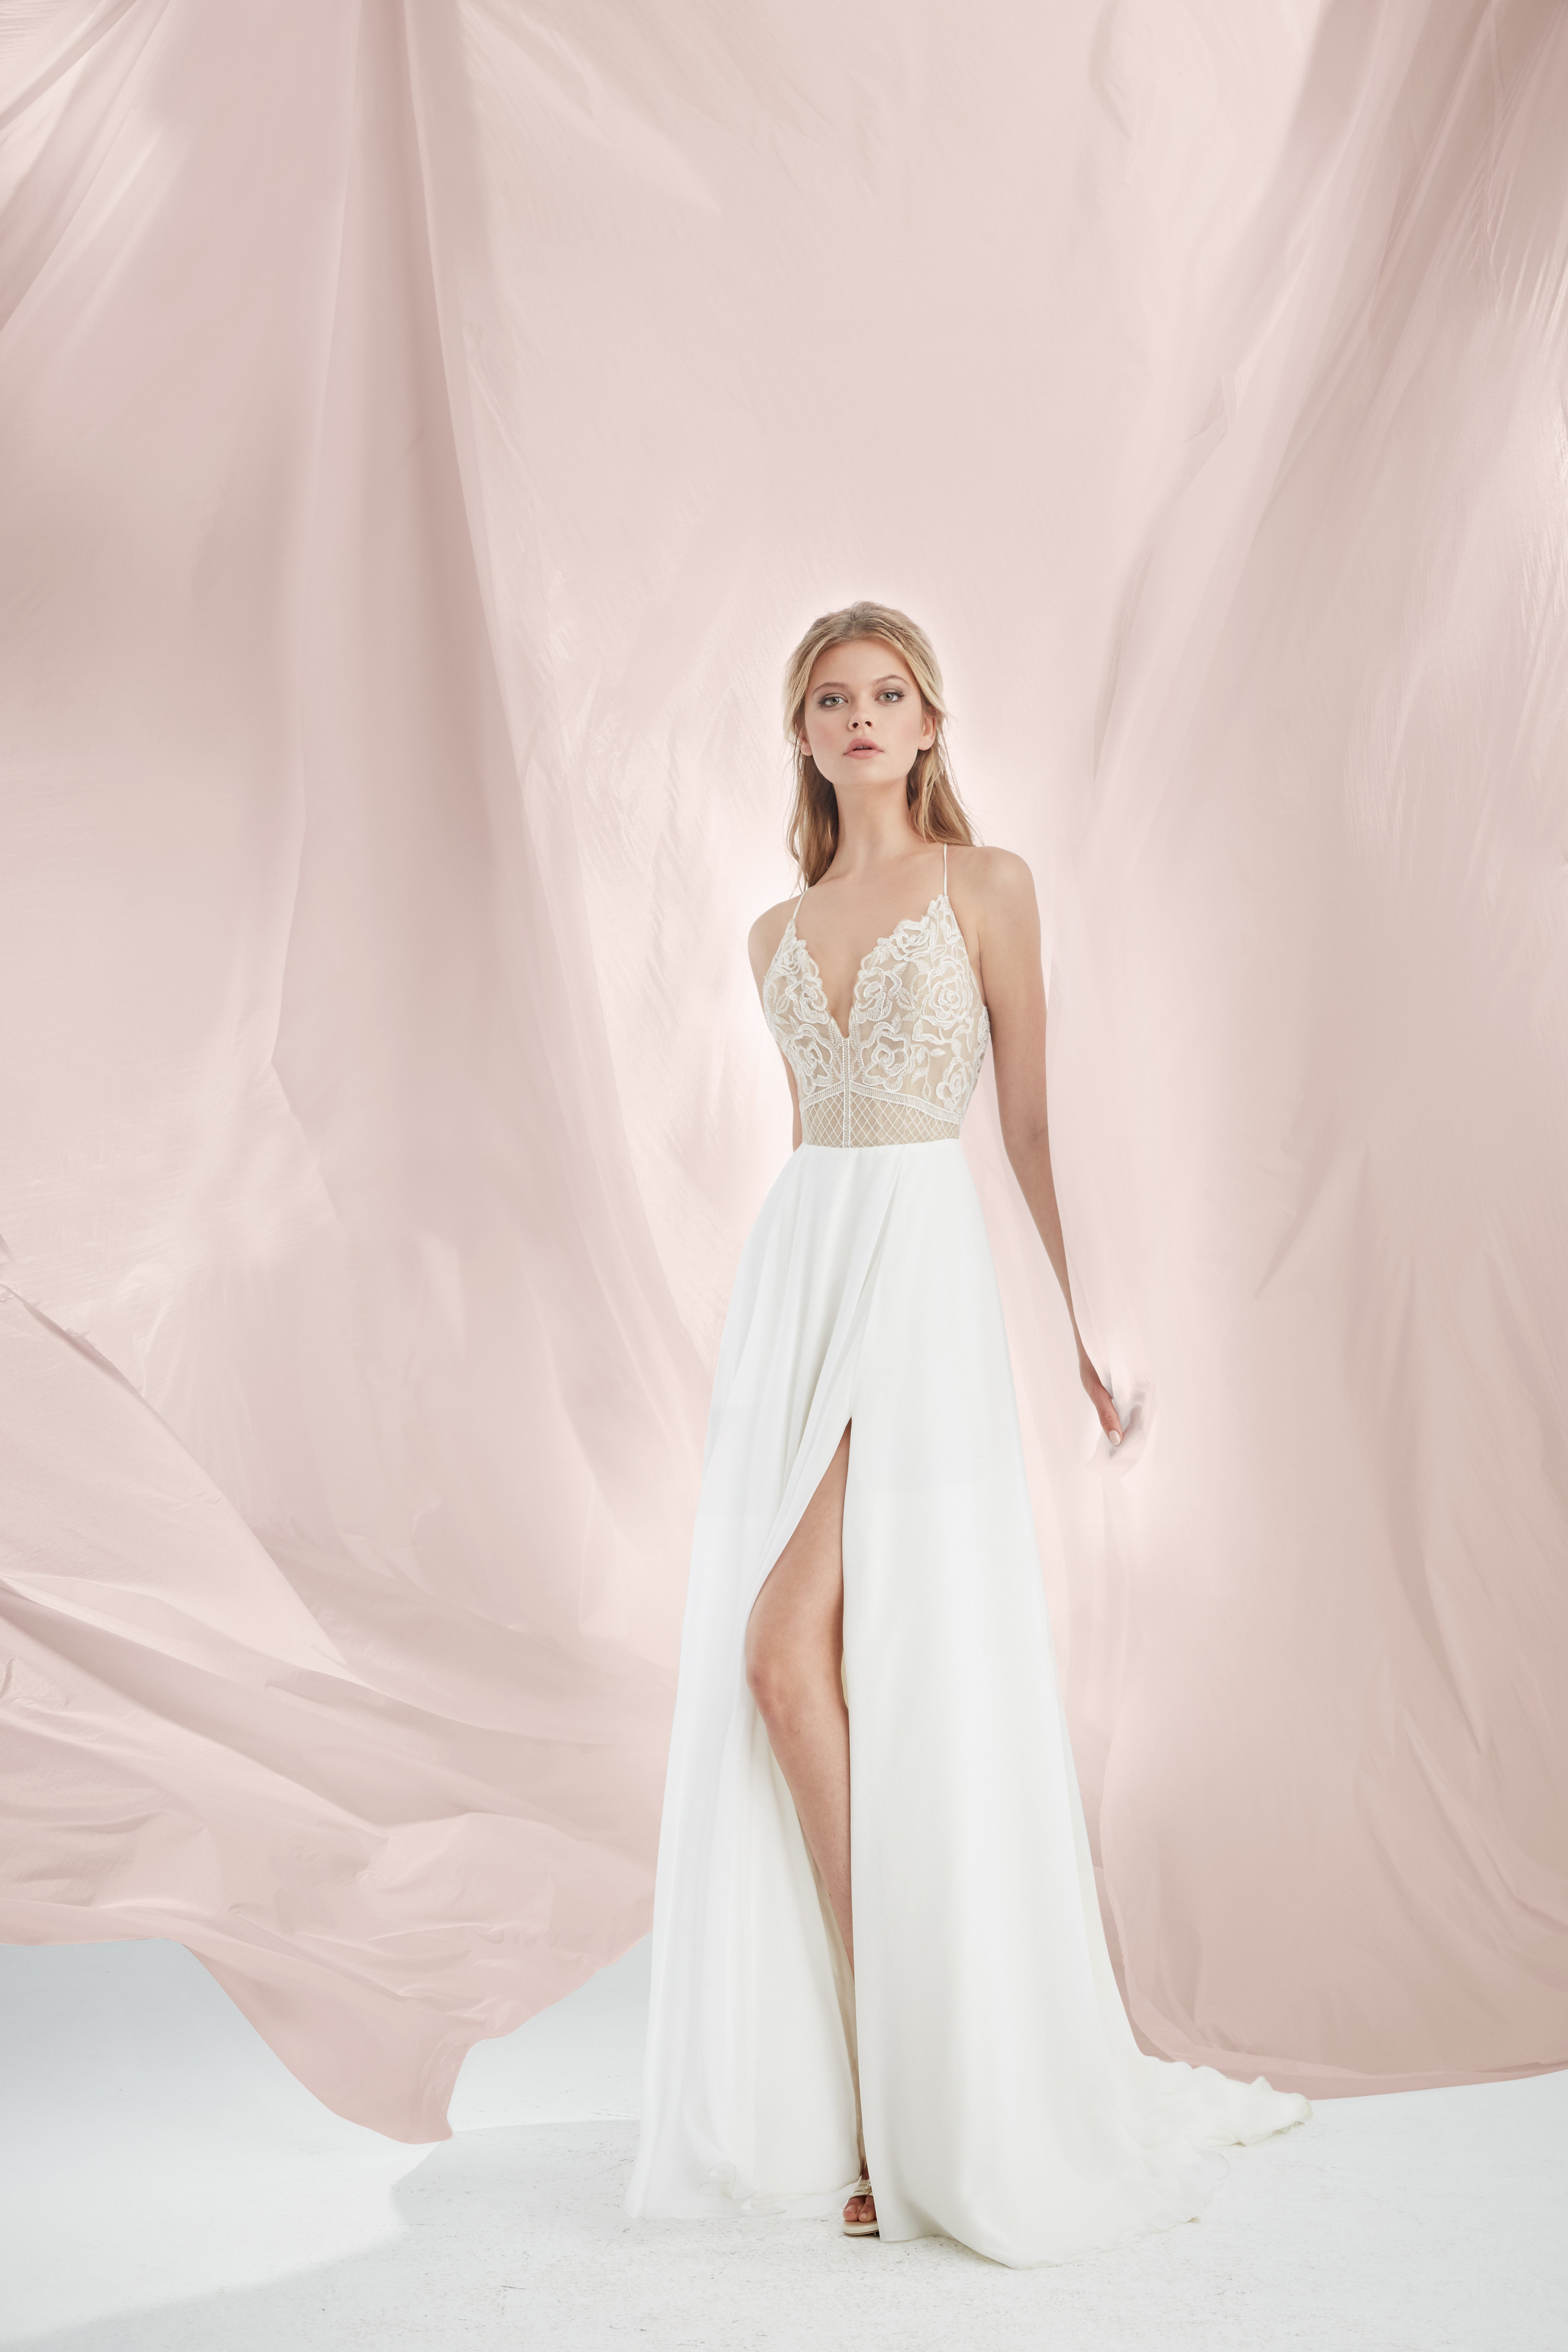 Blush Bridal Gowns